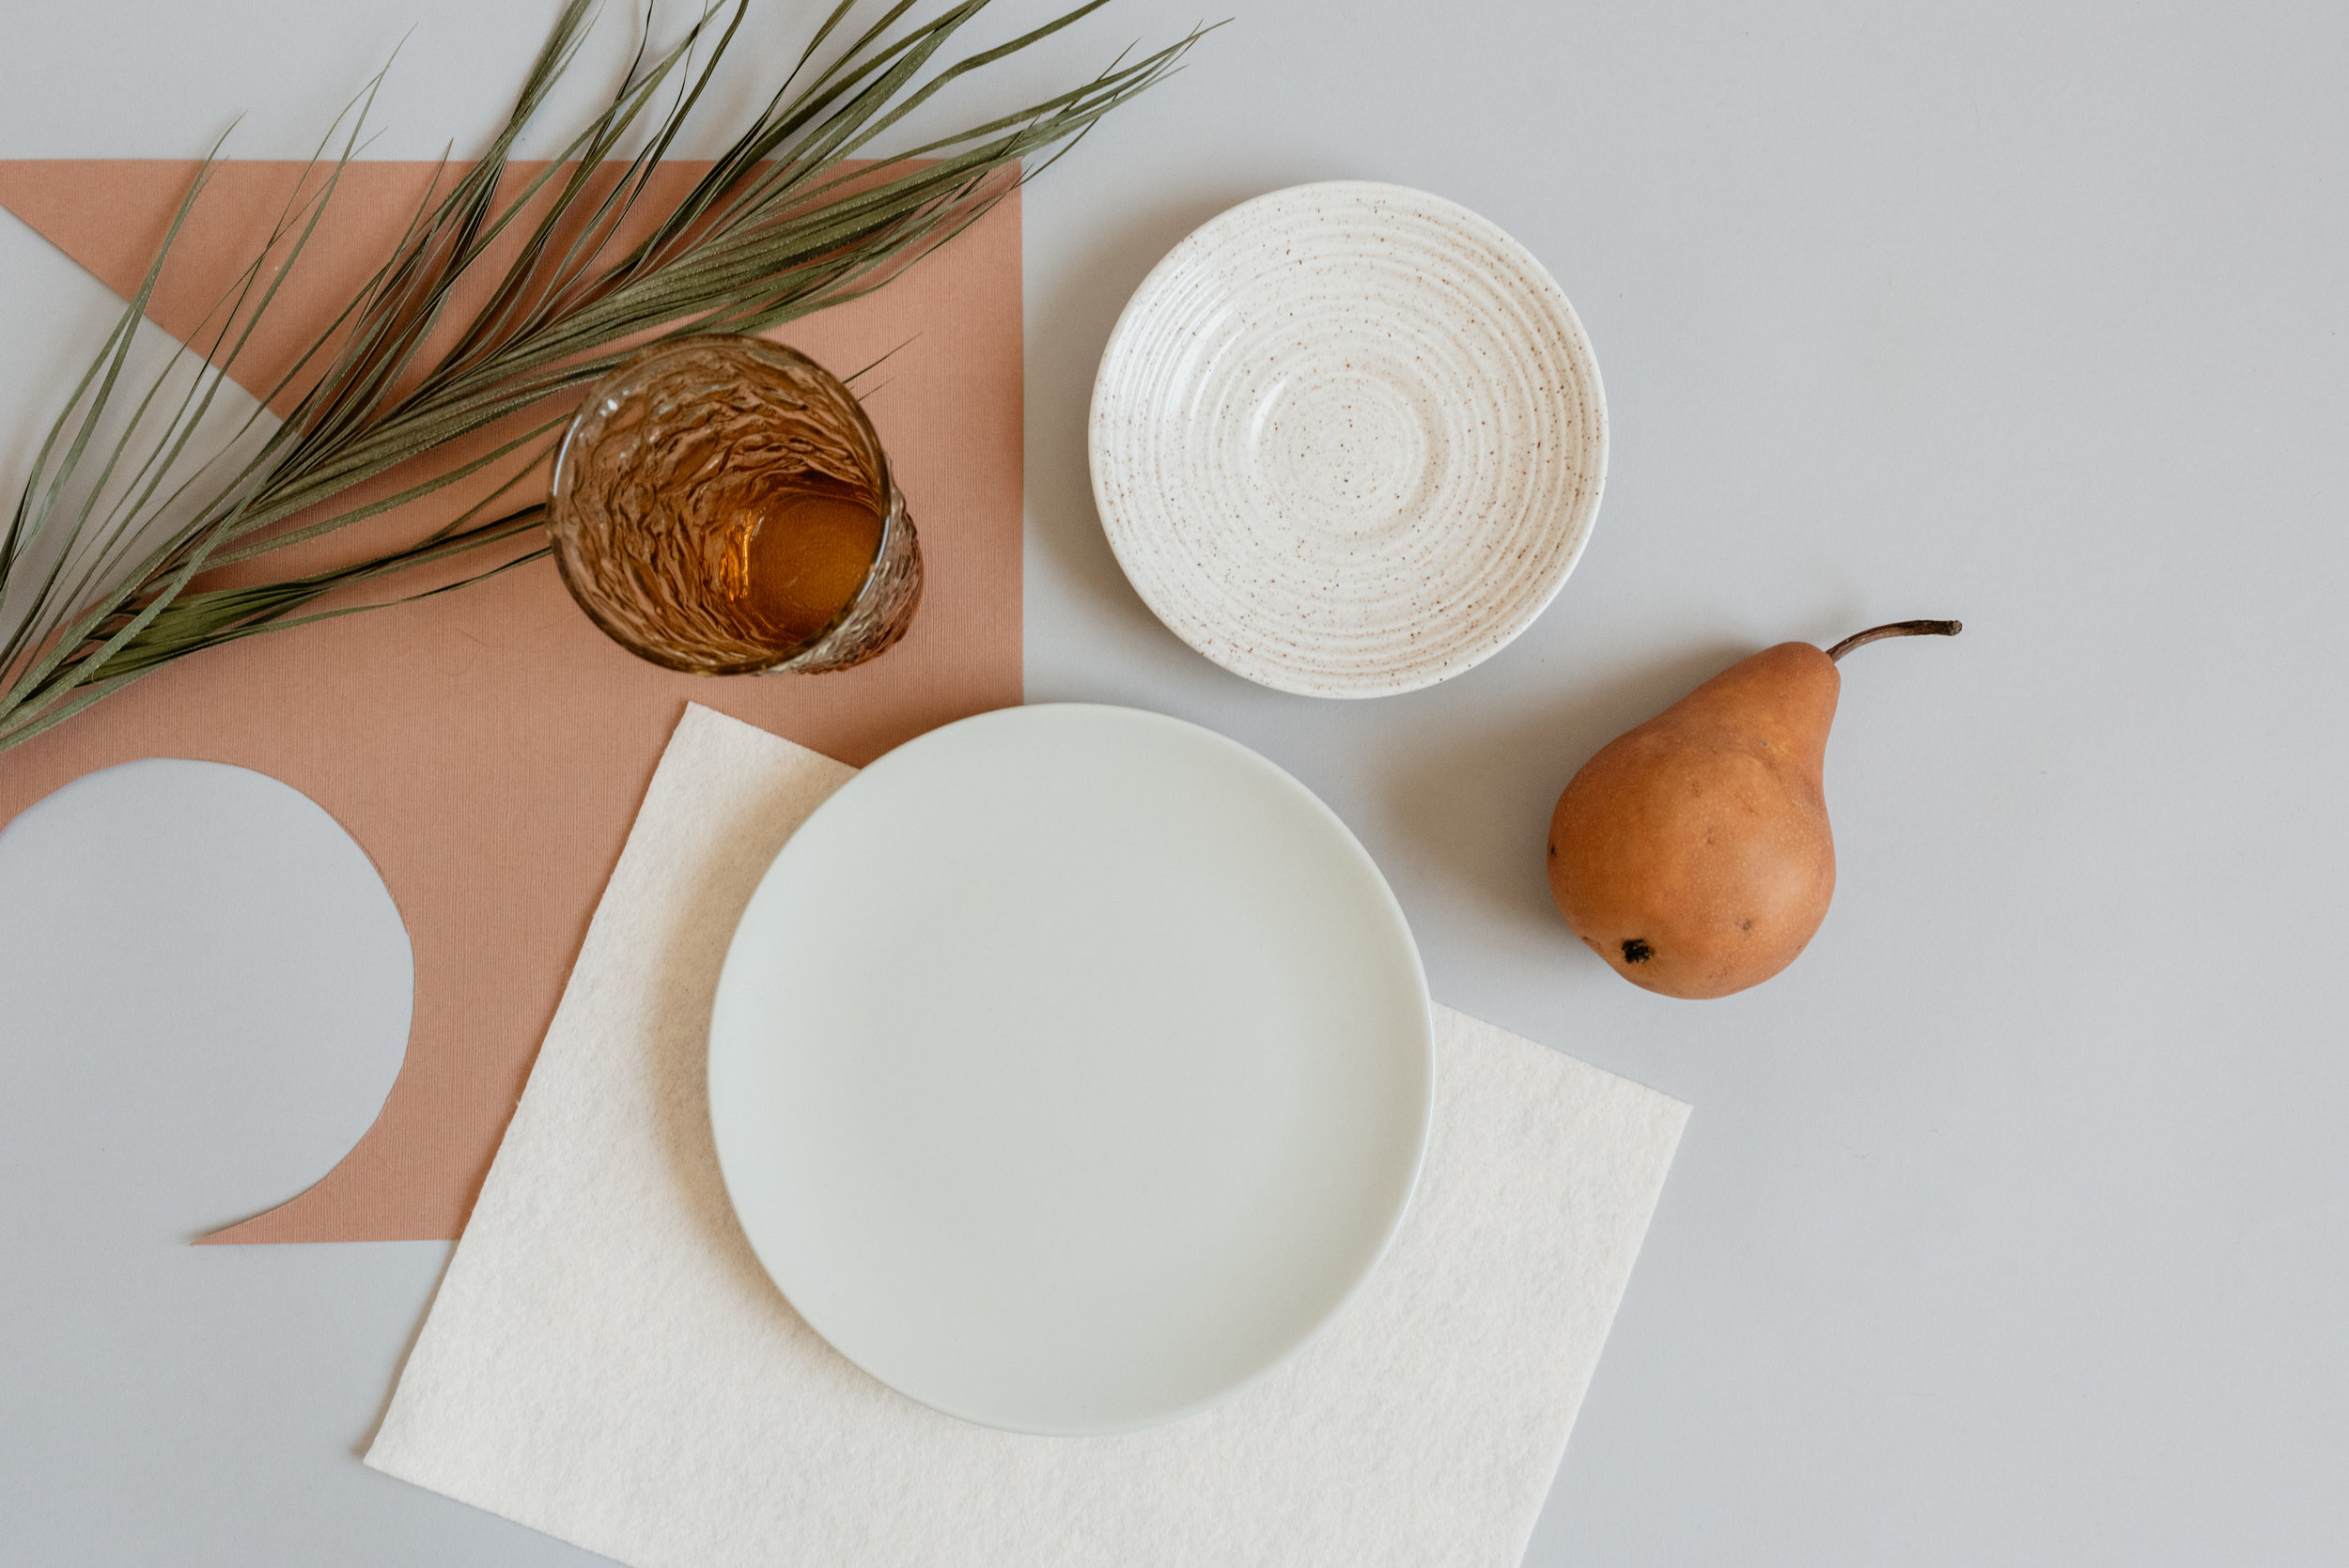 pastel-plates-23.jpg